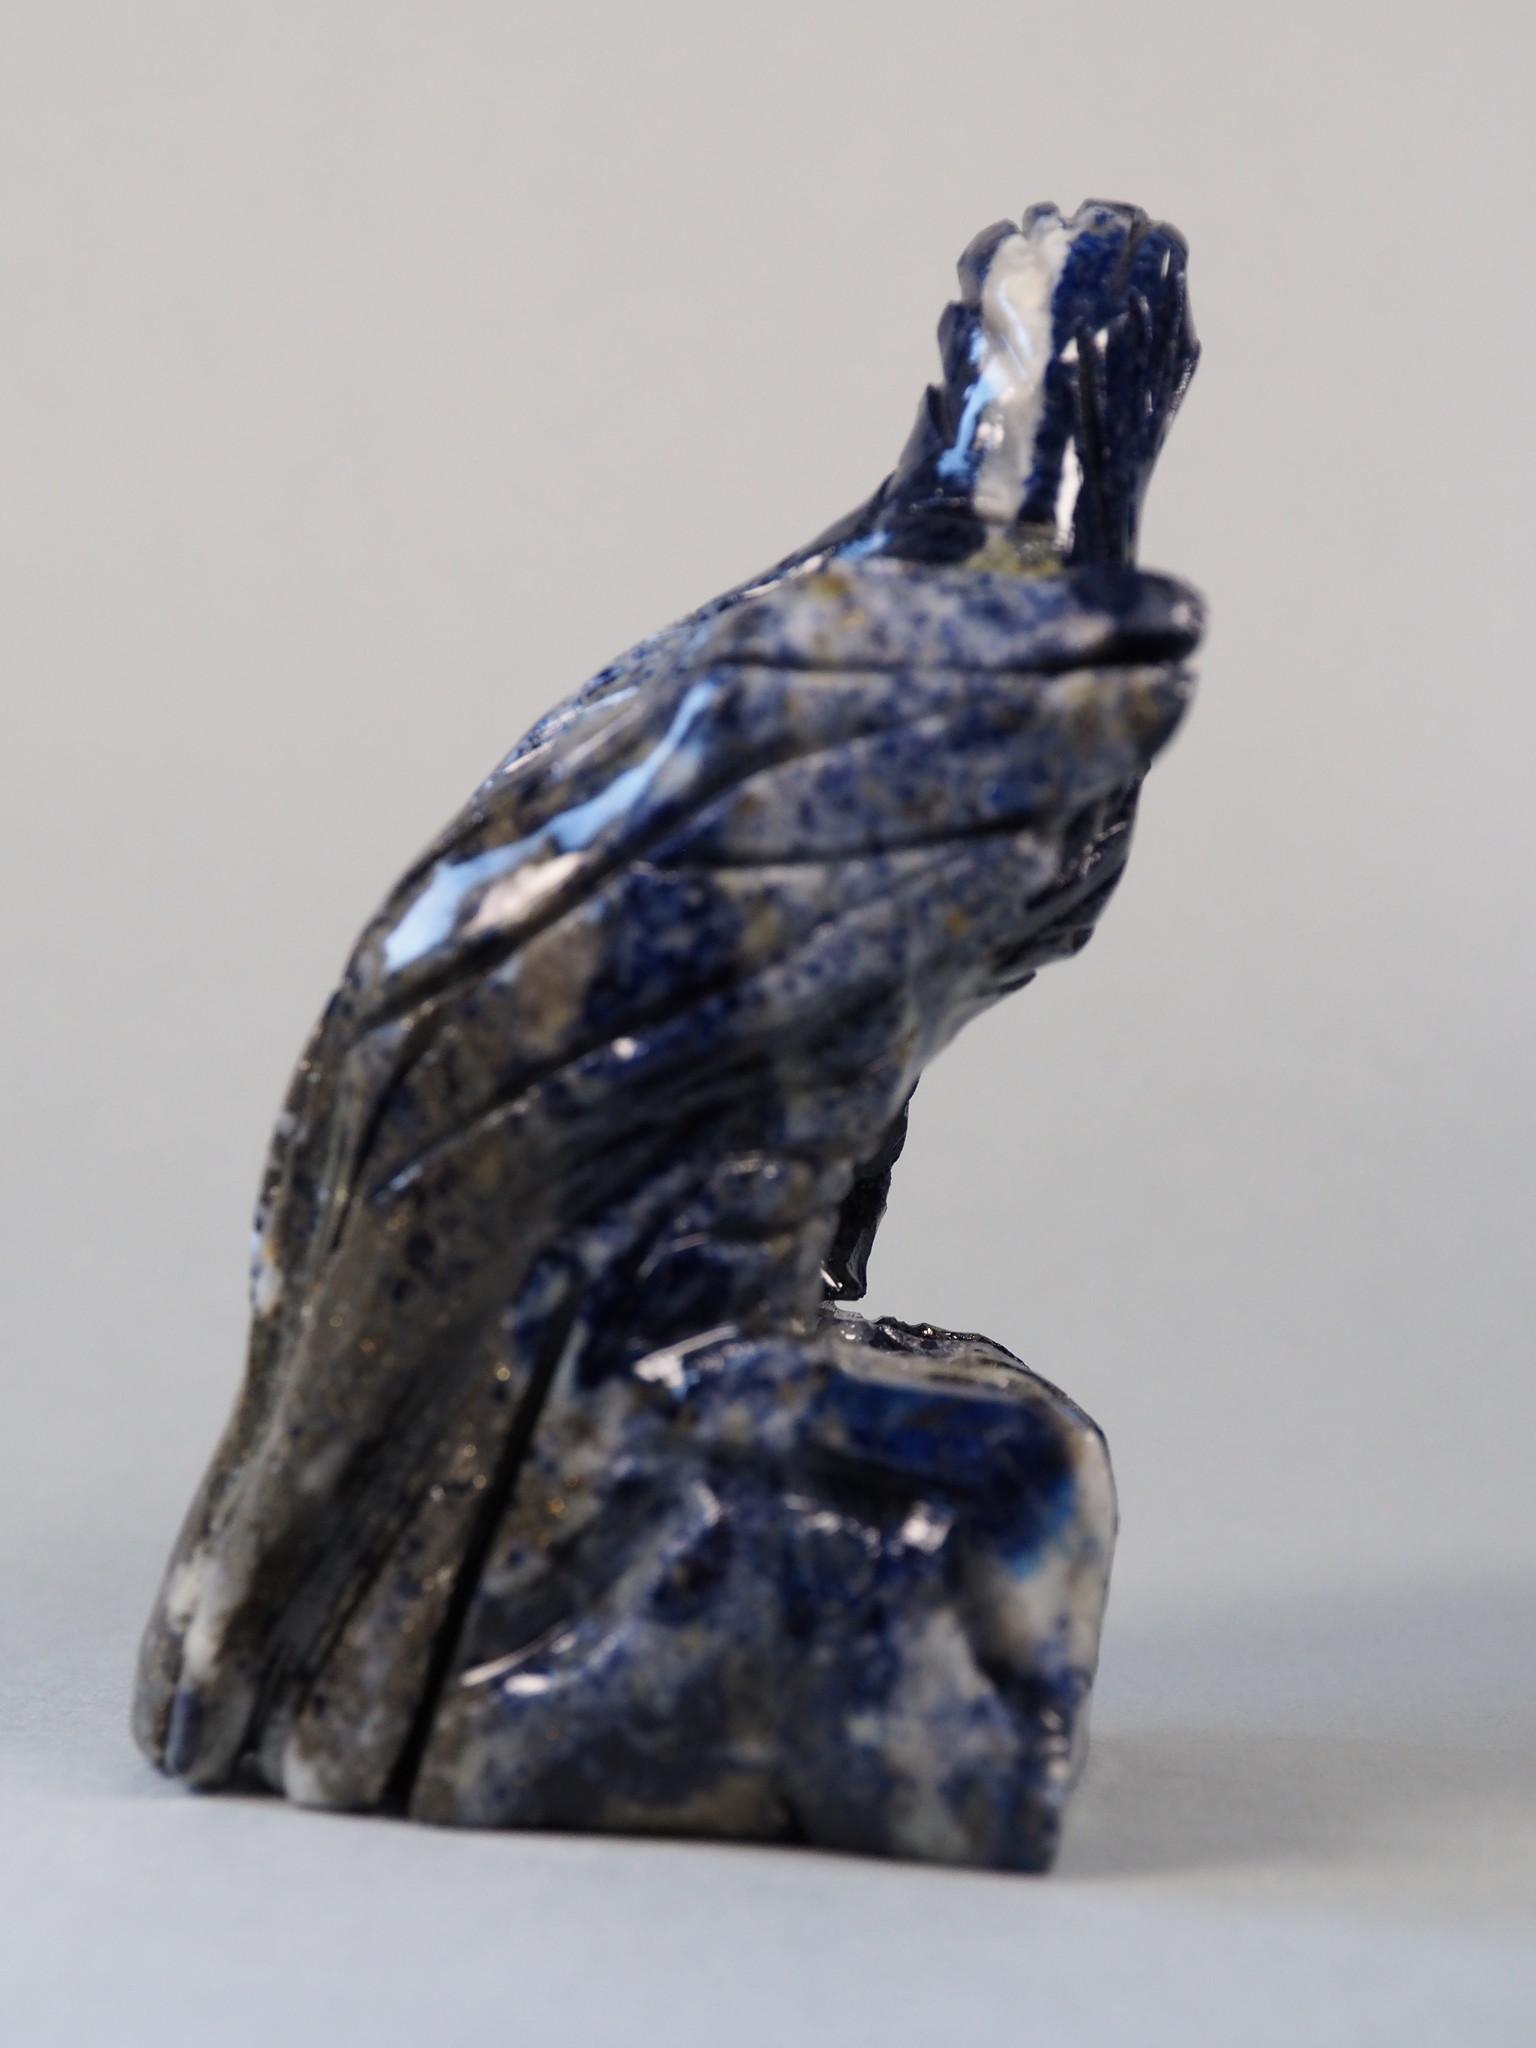 Extravagant Royal blau Lapis lazuli  tier figur briefbeschwere Adler Nr:21/ 10